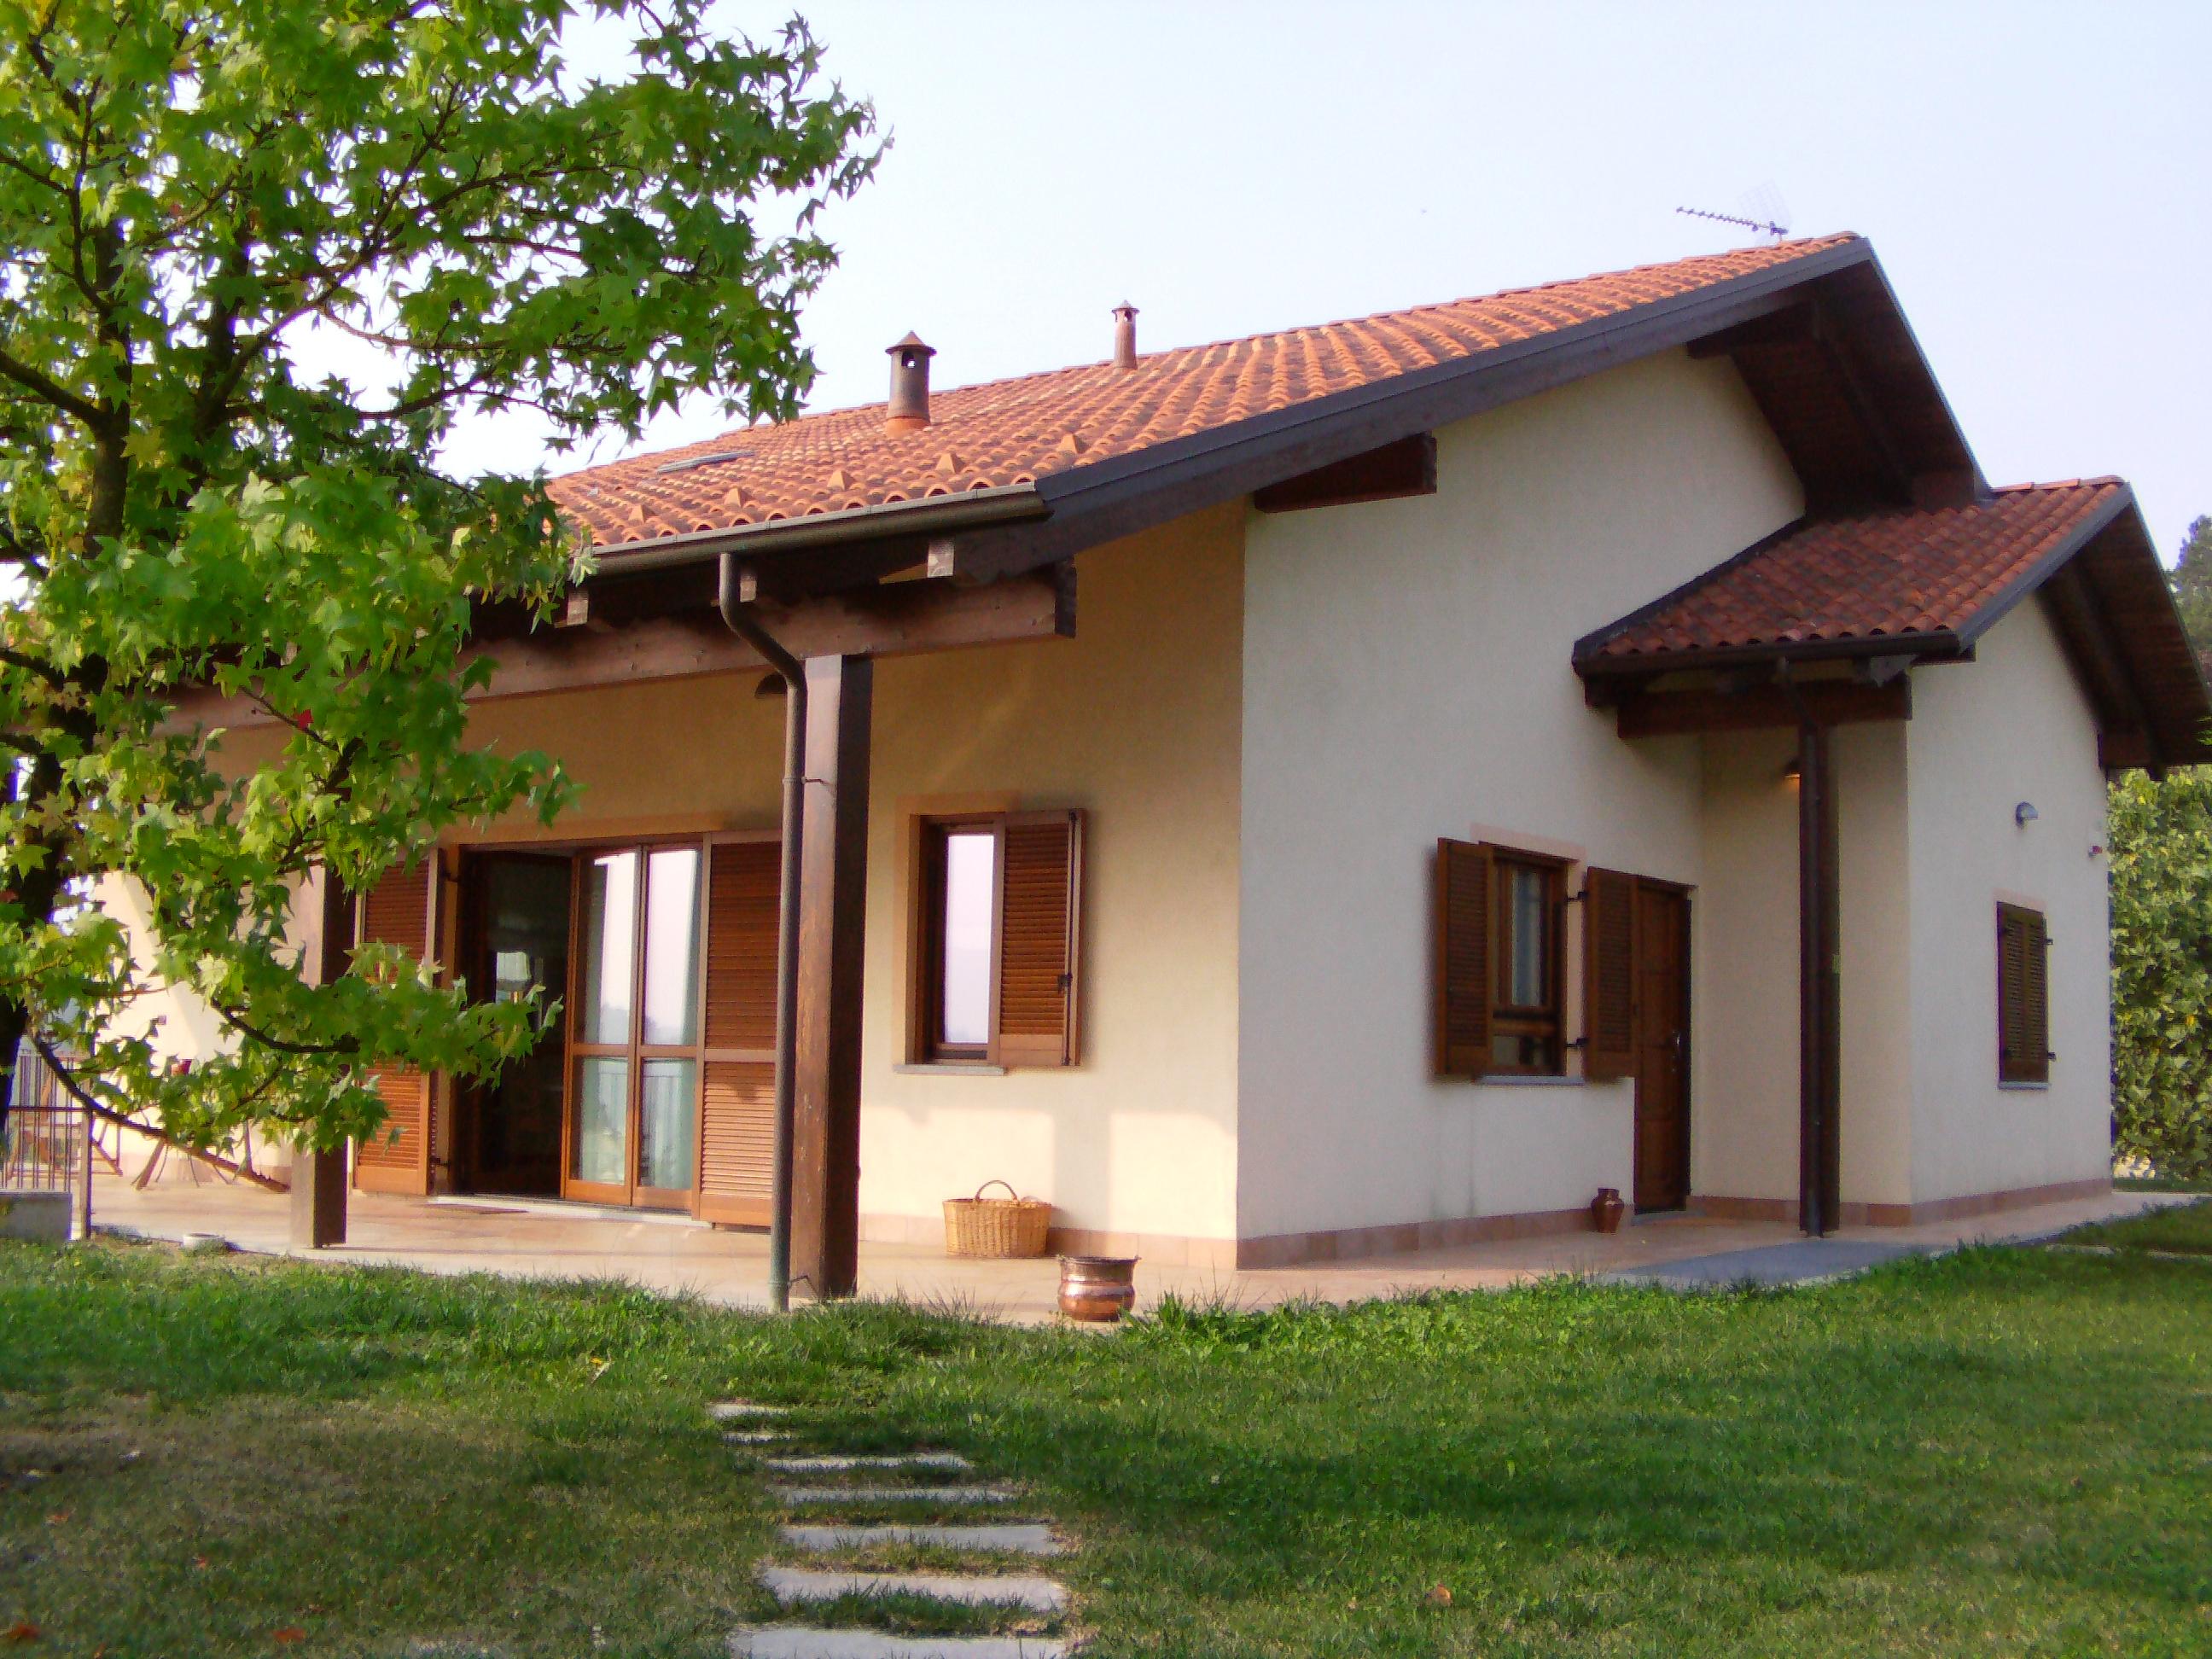 Piscine All Aperto Piemonte la casa del nonno - villas for rent in mongardino, piemonte